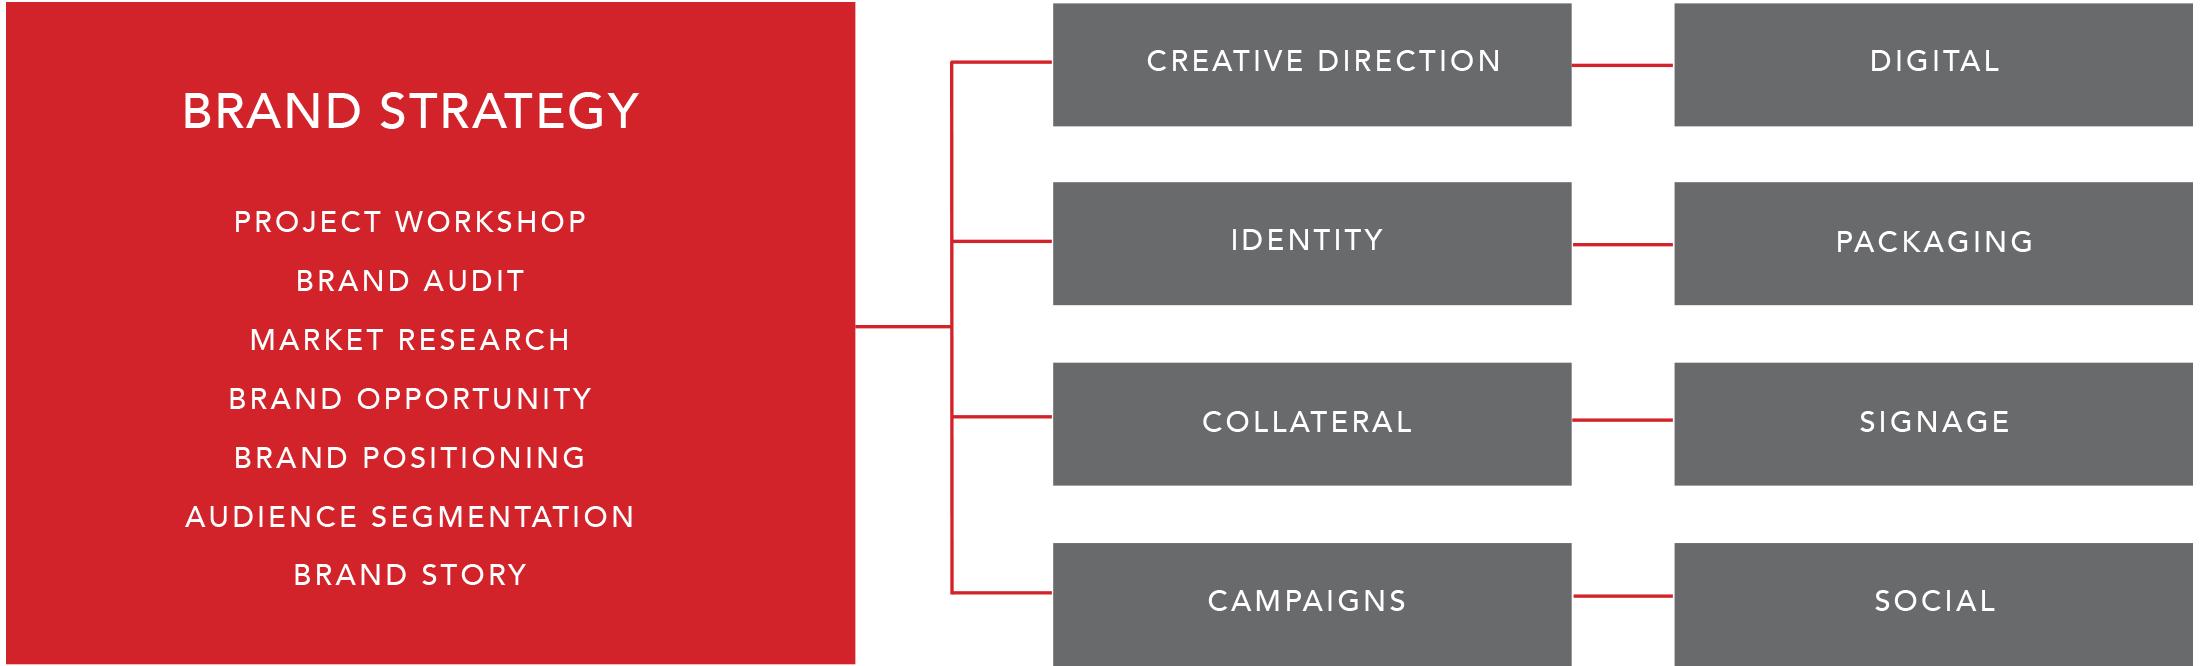 Logo The O Group - Luxury Brand Marketing and Creative Agency